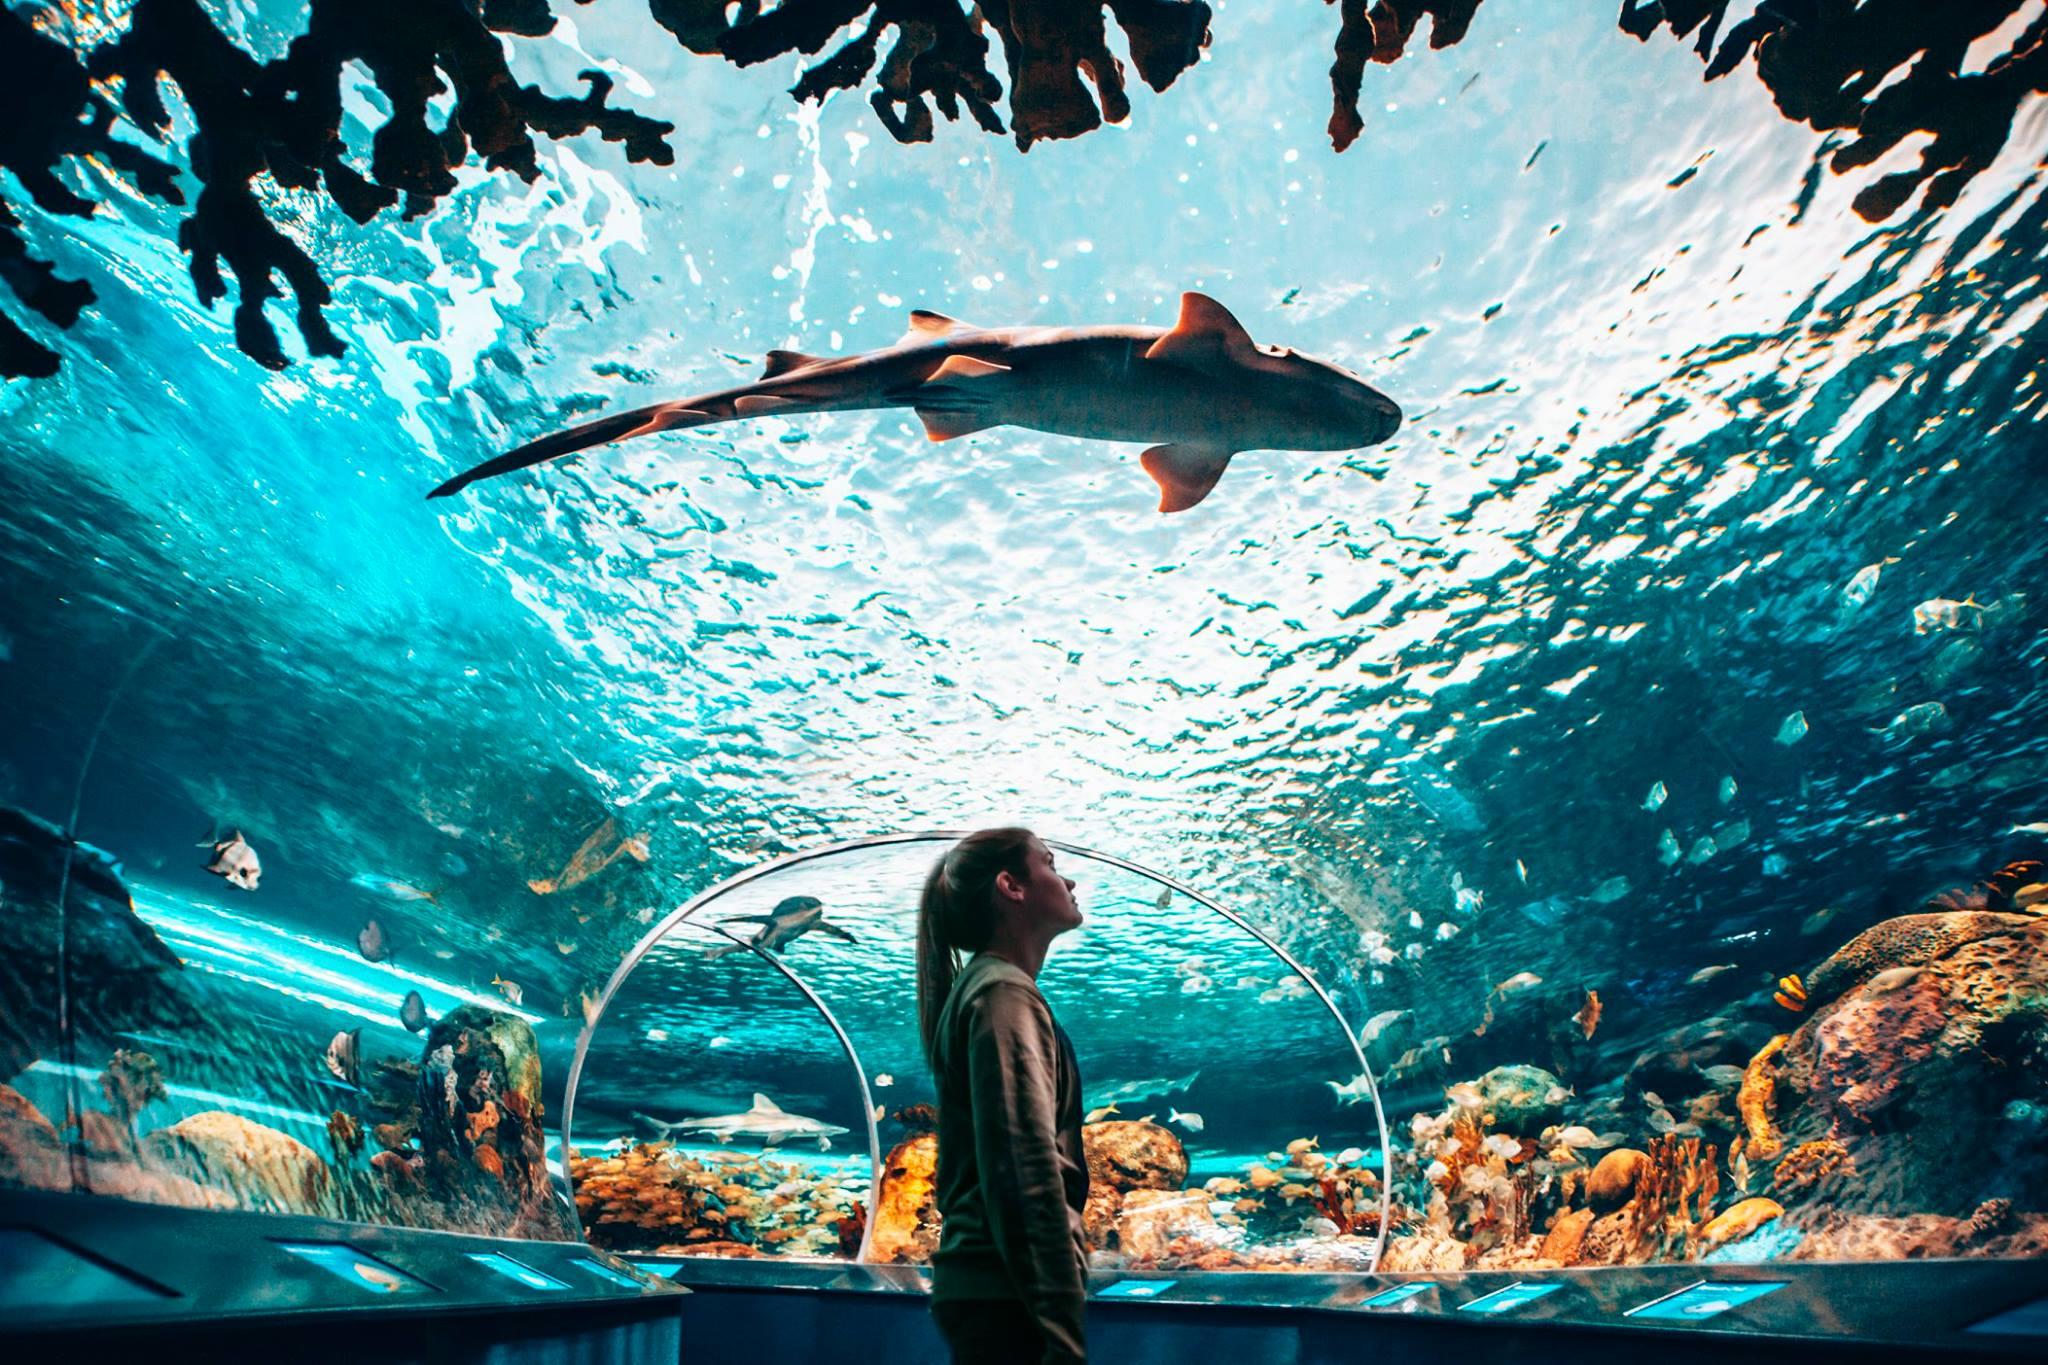 Ripley's Aquarium in Toronto is shining a light on ocean ...